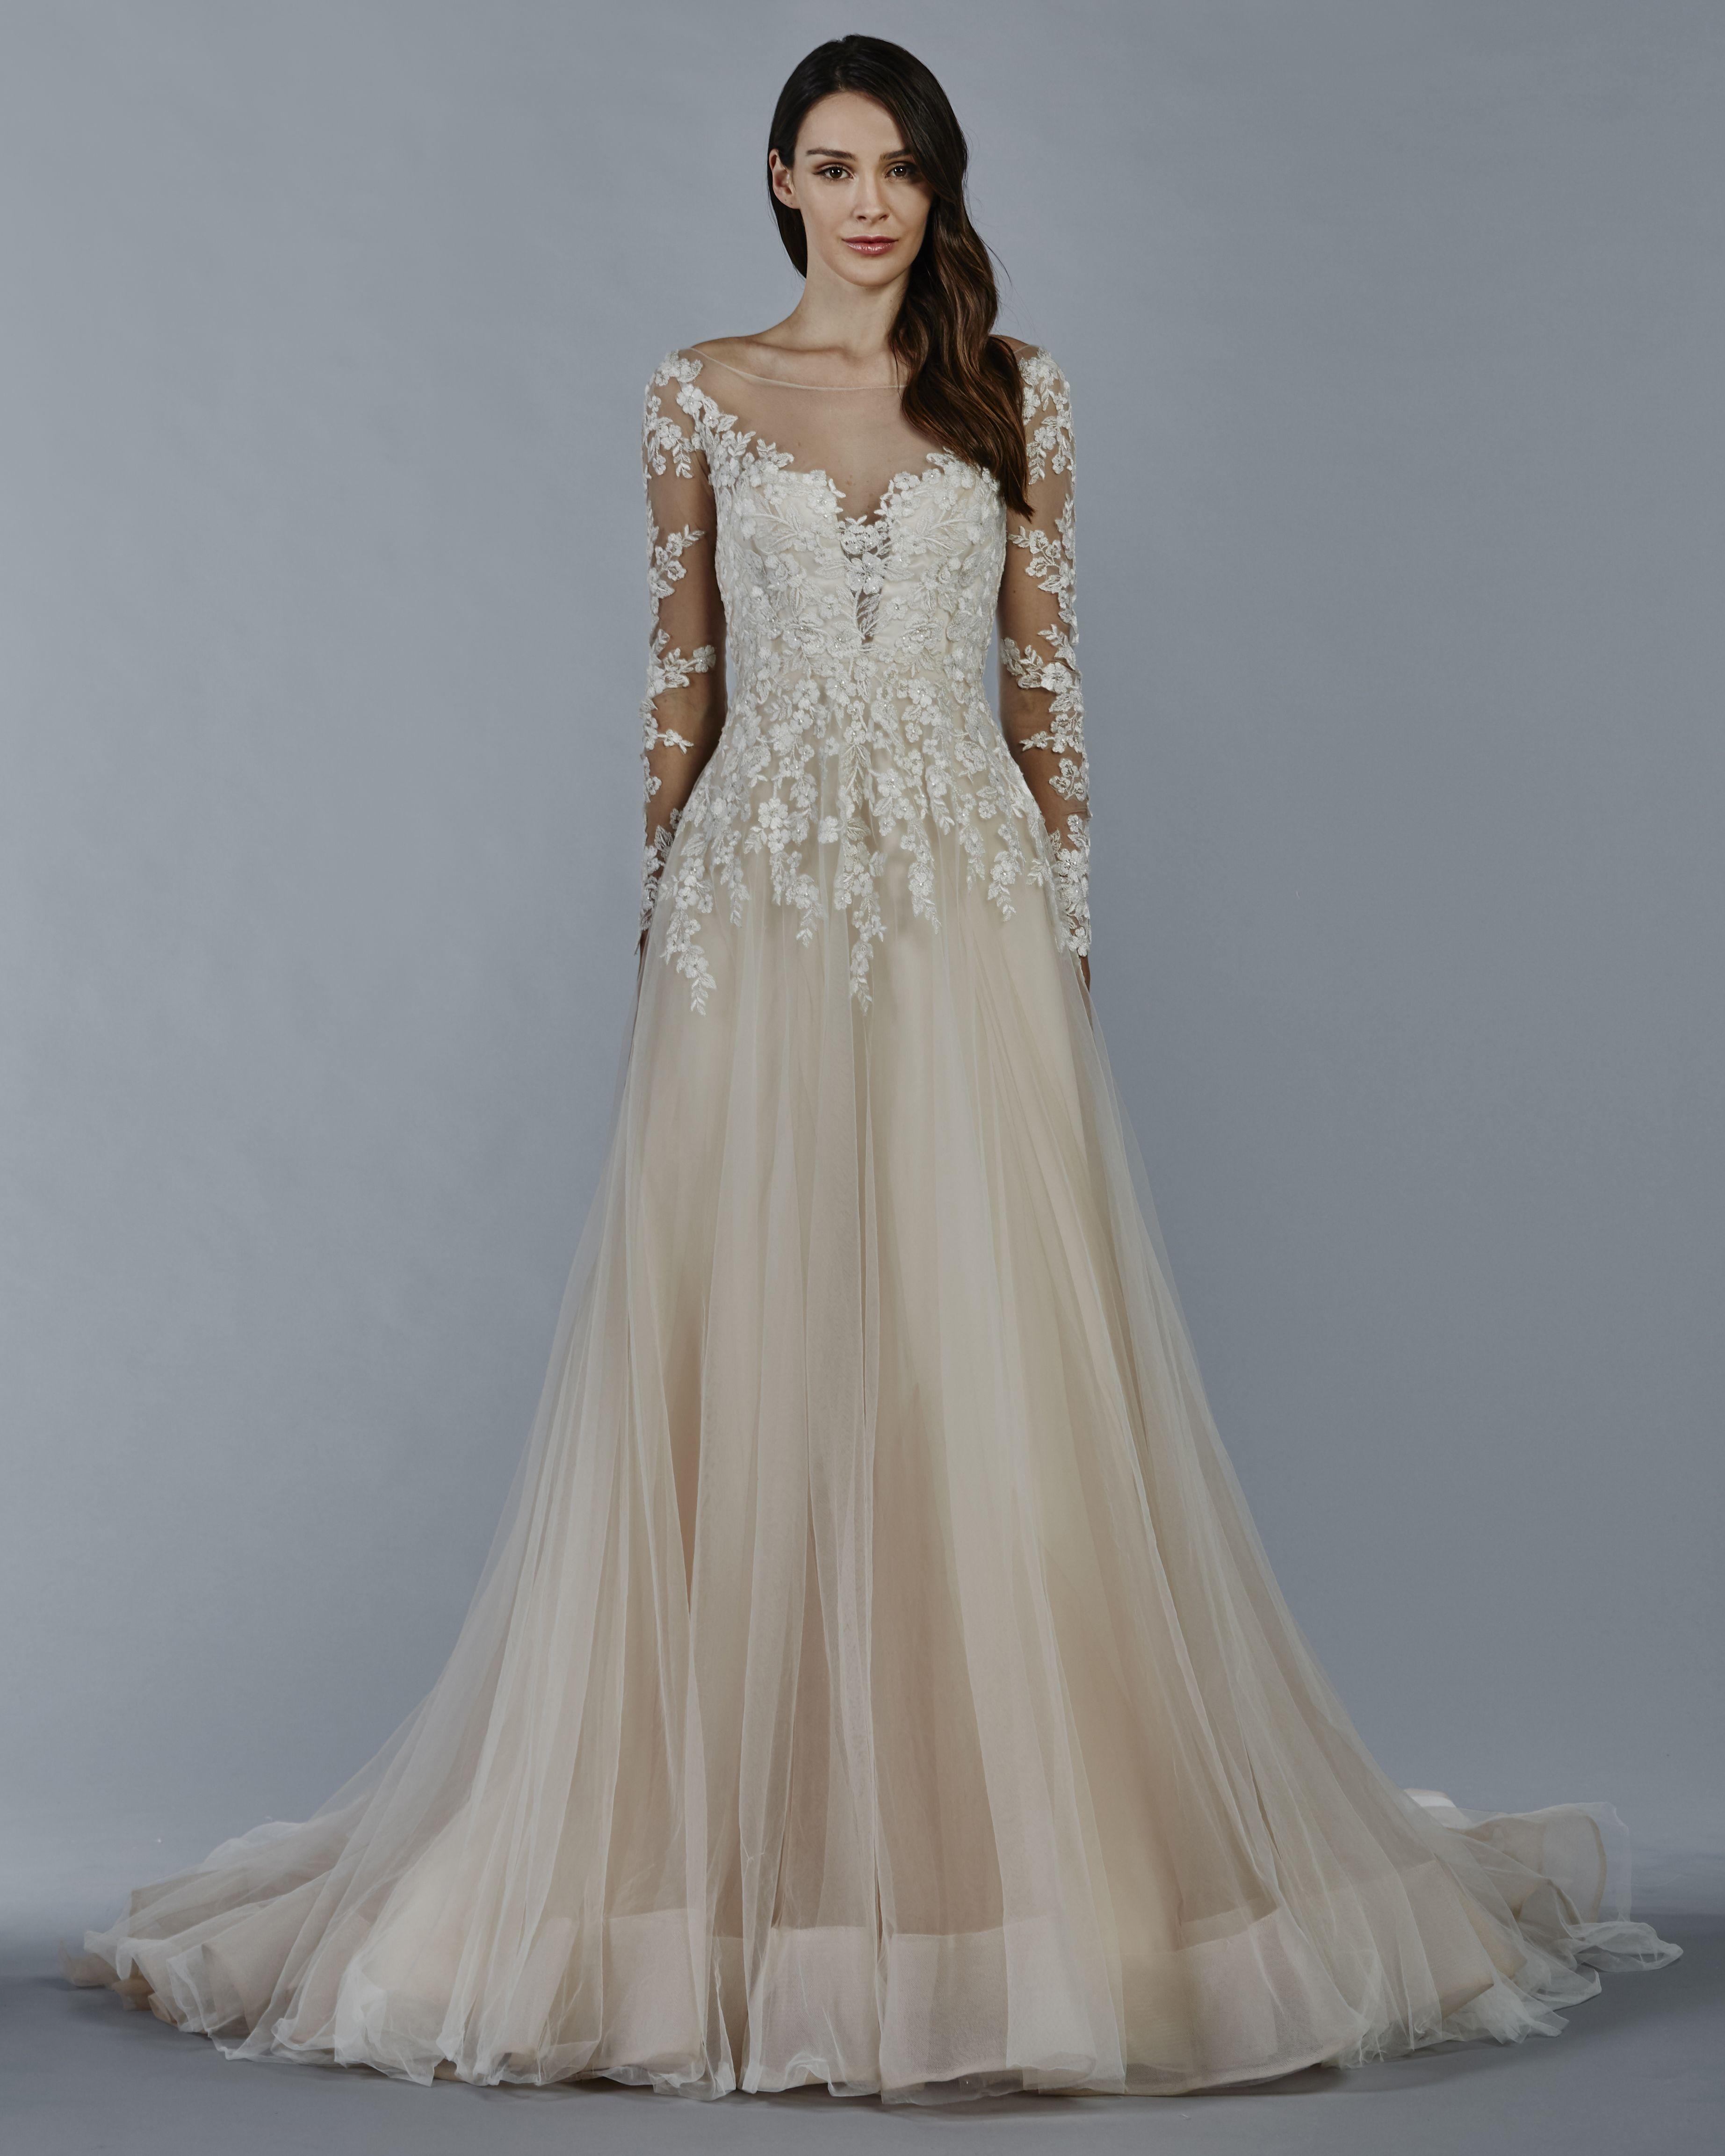 Kelly faetanini herbst braut kollektion horsehair ball gowns